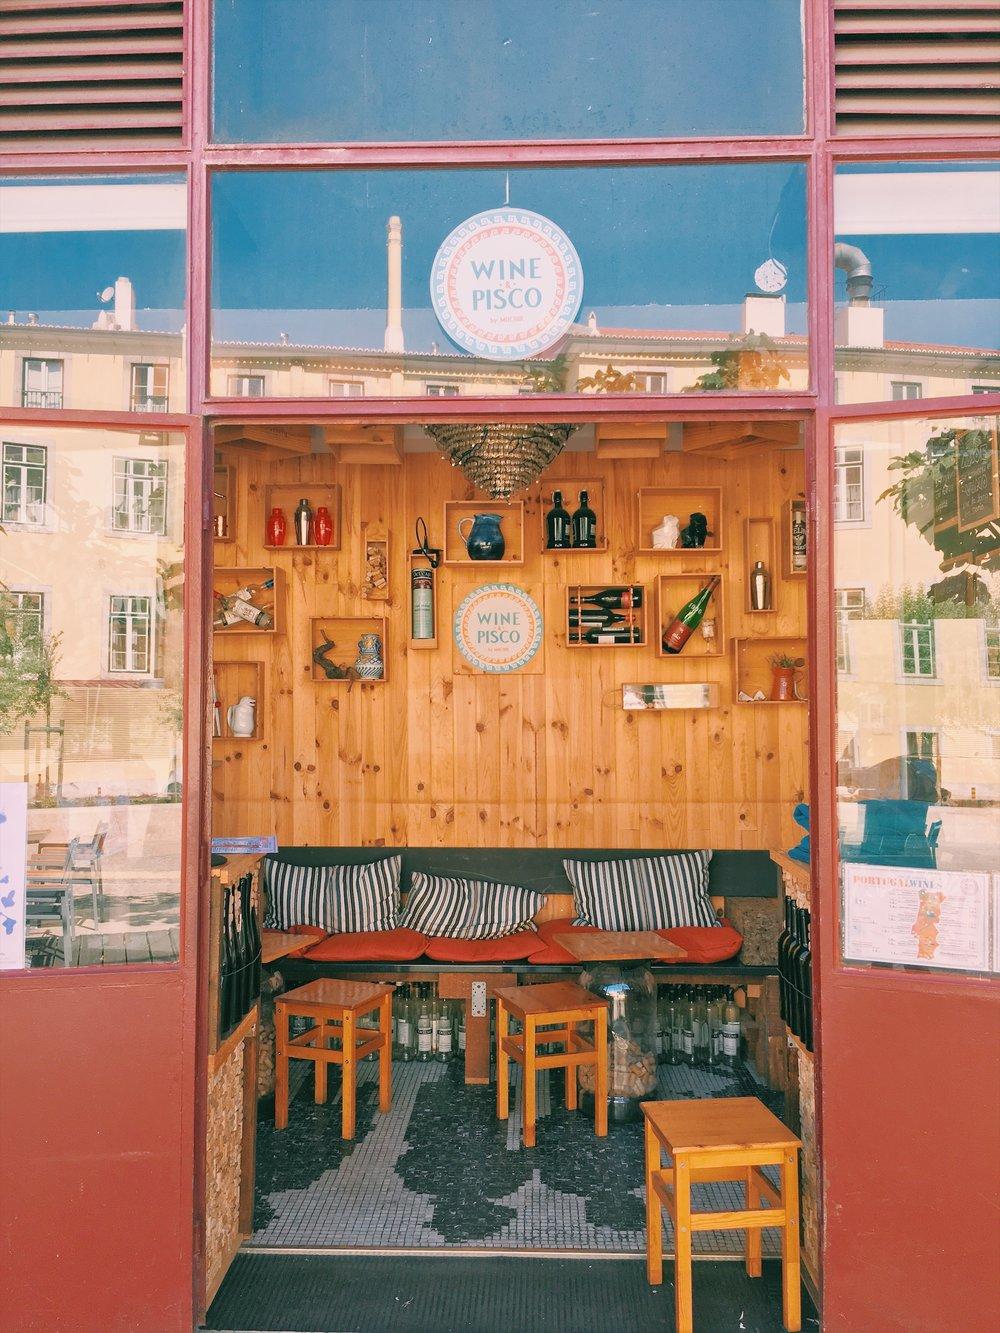 Wine-Pisco-Lisbon.jpg